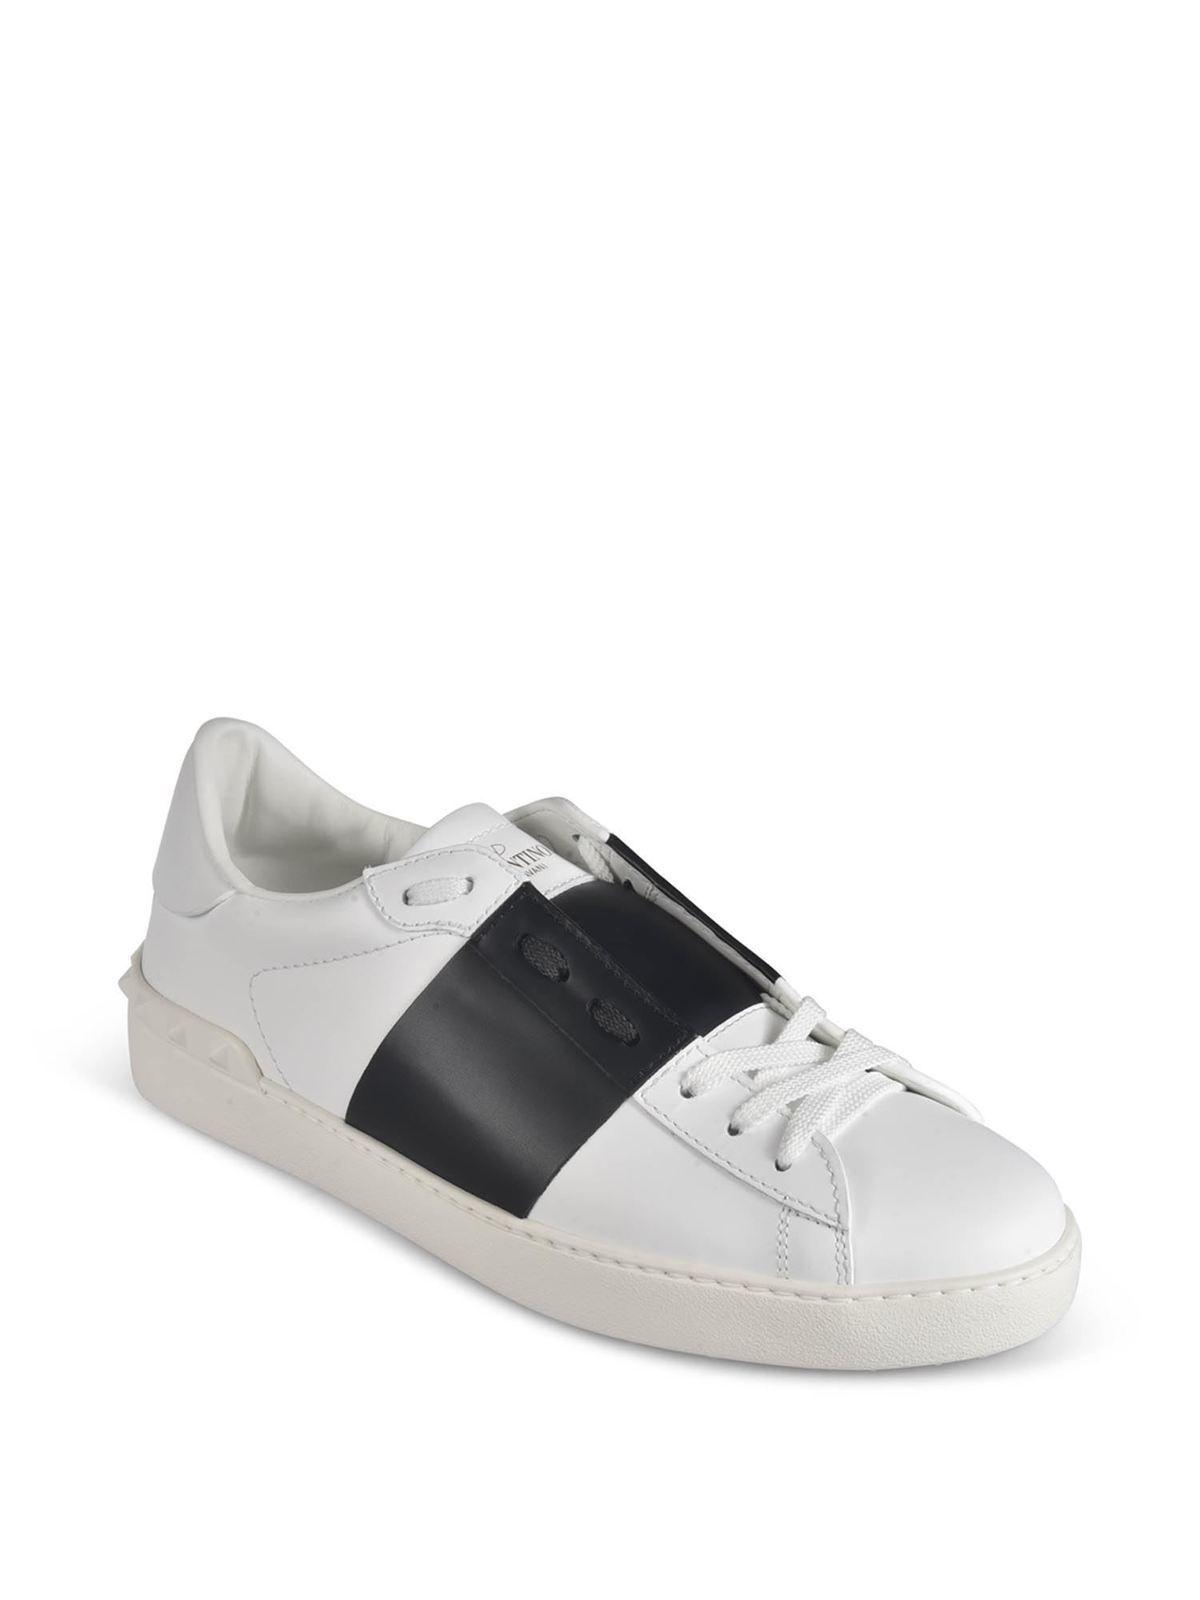 Valentino Garavani - Open sneakers in